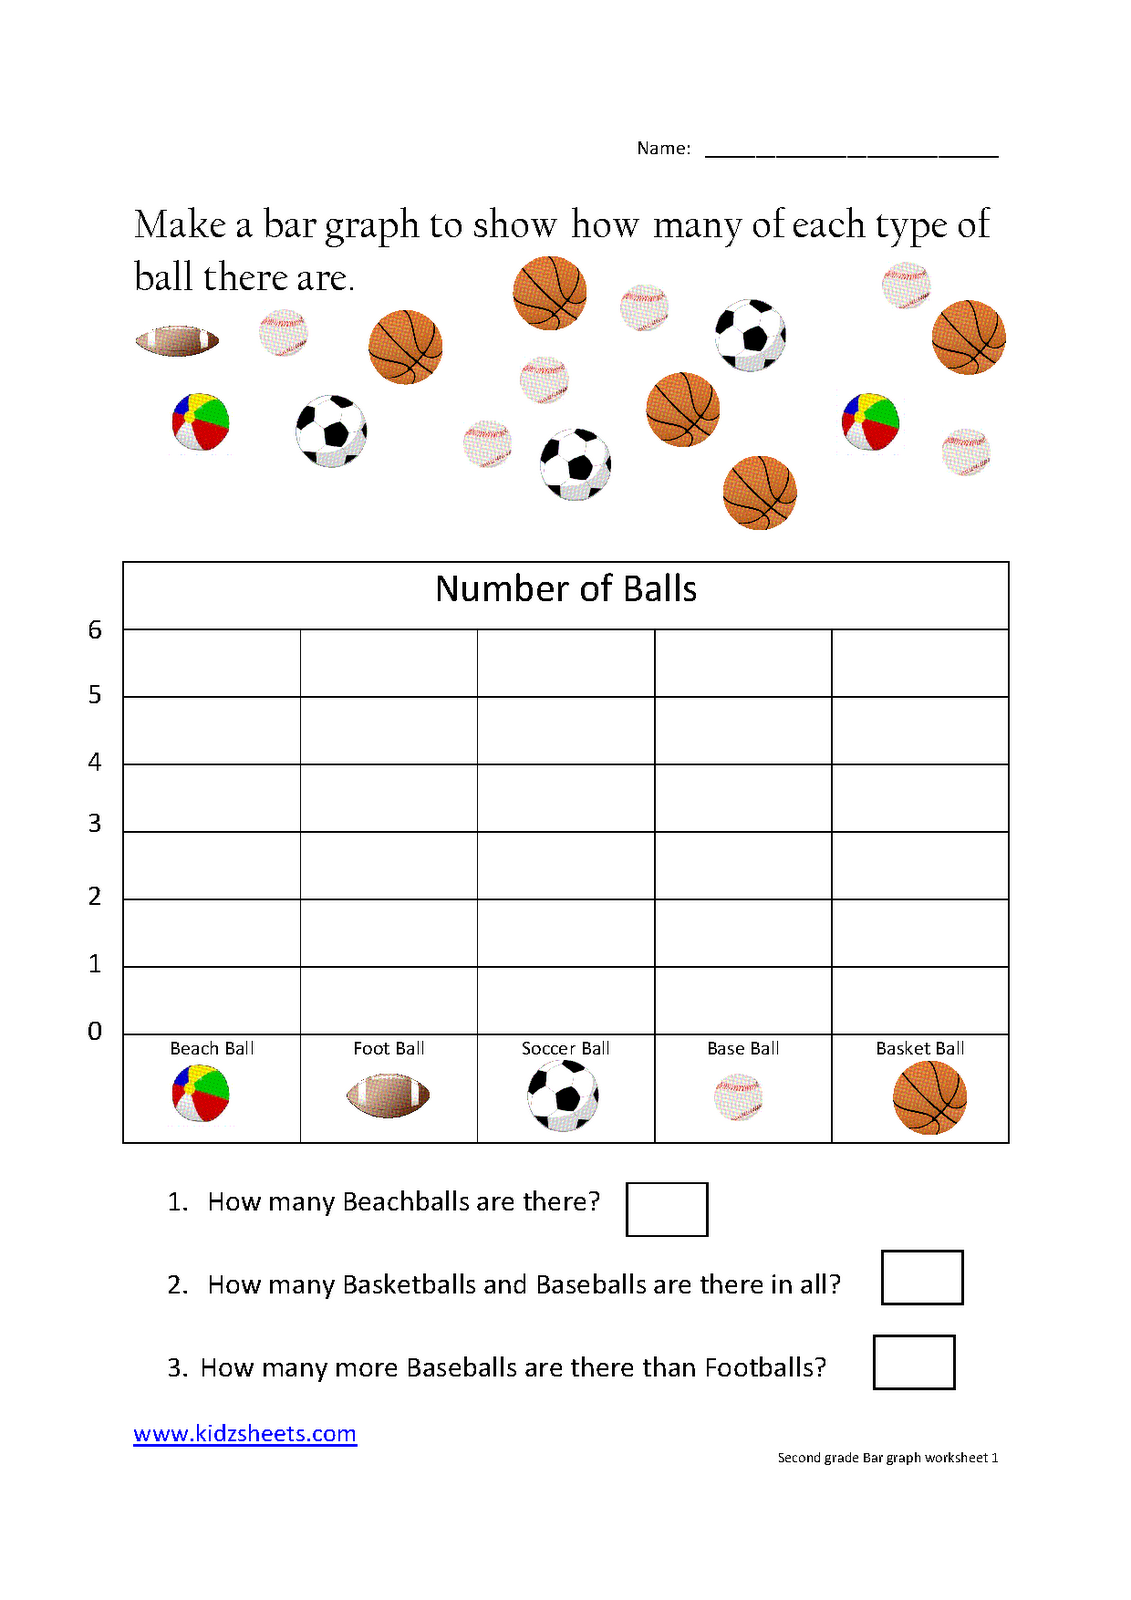 medium resolution of Kidz Worksheets: Second Grade Bar Graph Worksheet1   Kids math worksheets